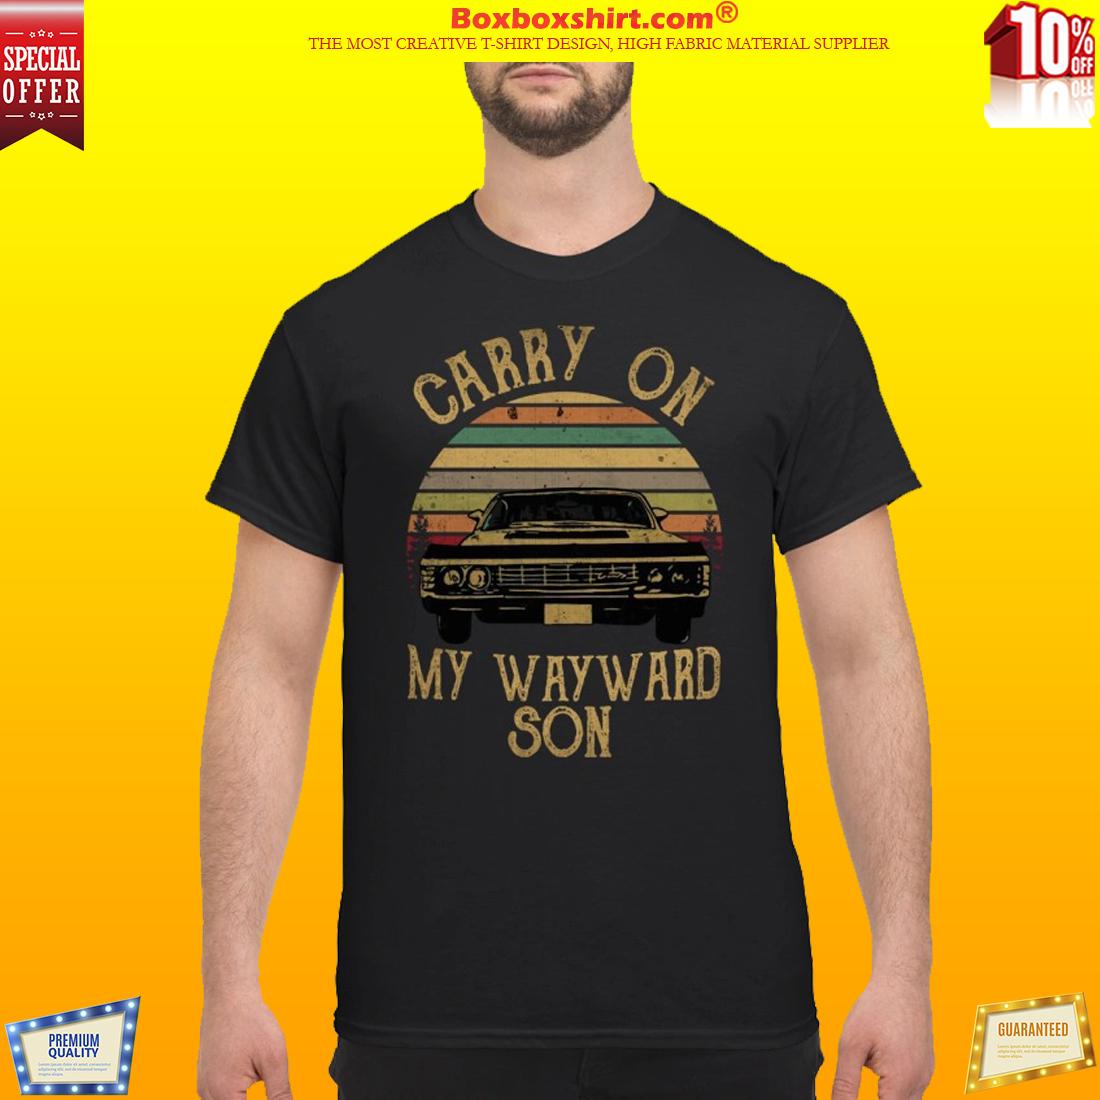 Car Carry on my wayward son shirt and sweatshirt